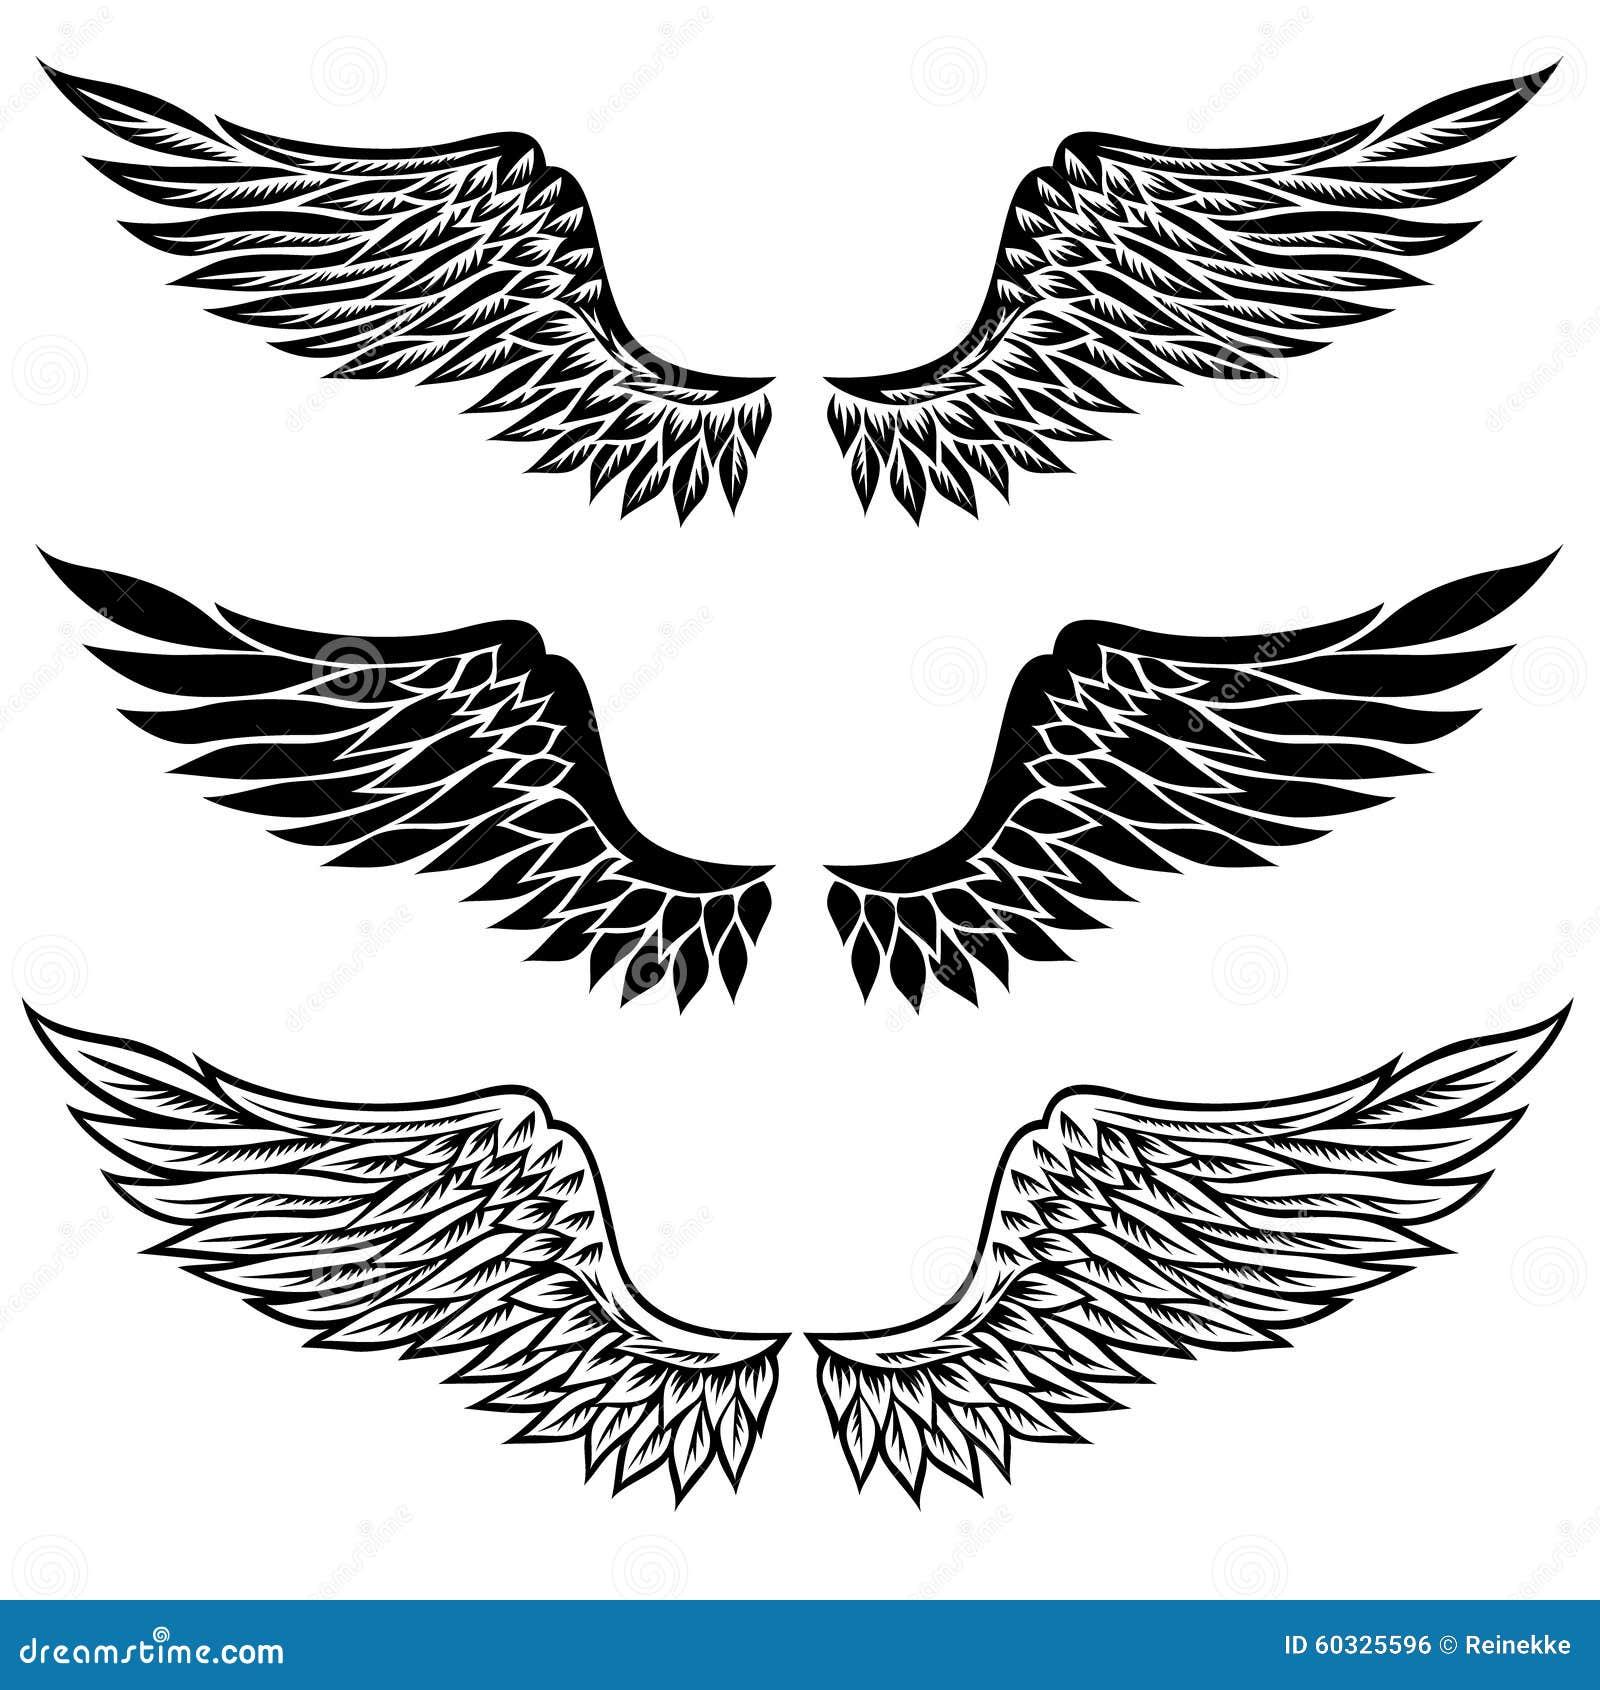 Image Result For Eagle Audio